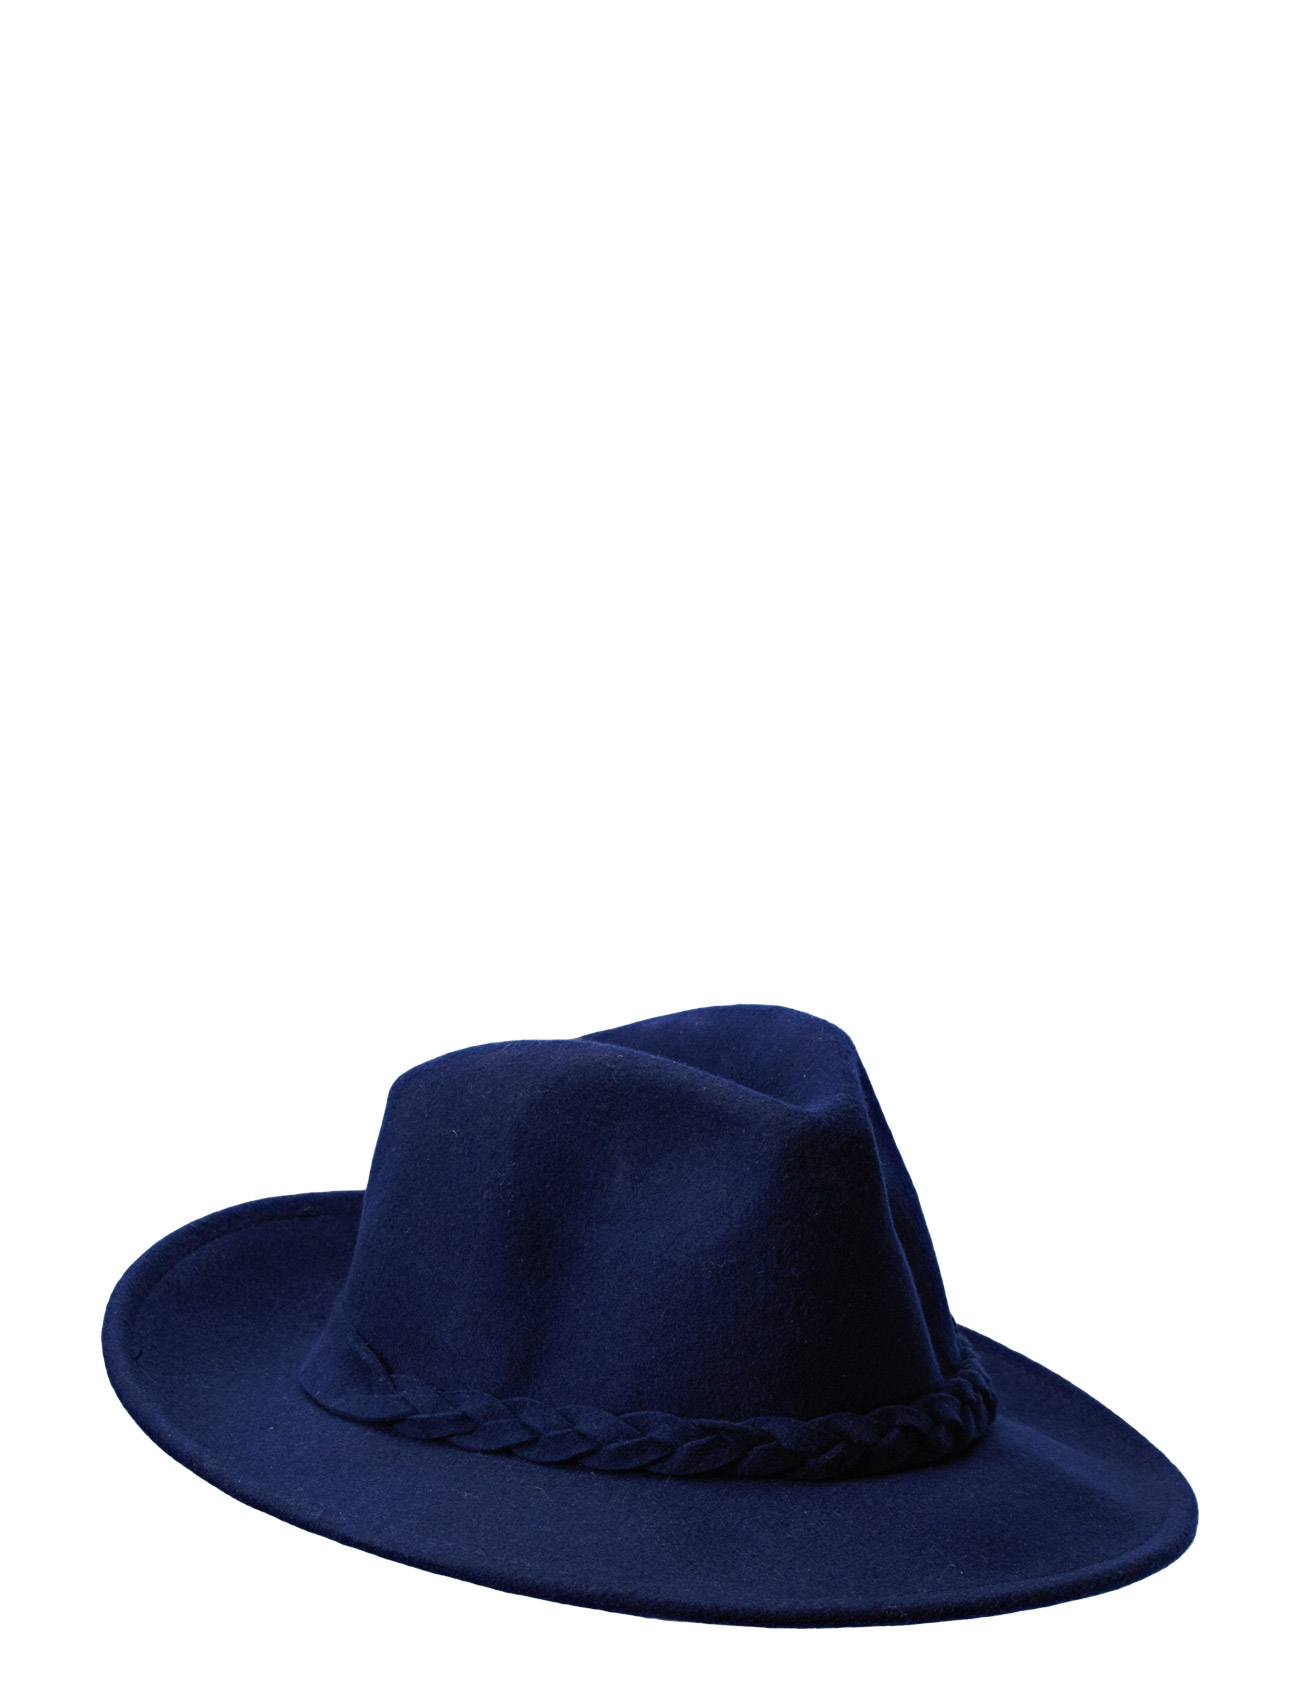 Chester Hat Accessories Minimum Hatte & Caps til Kvinder i